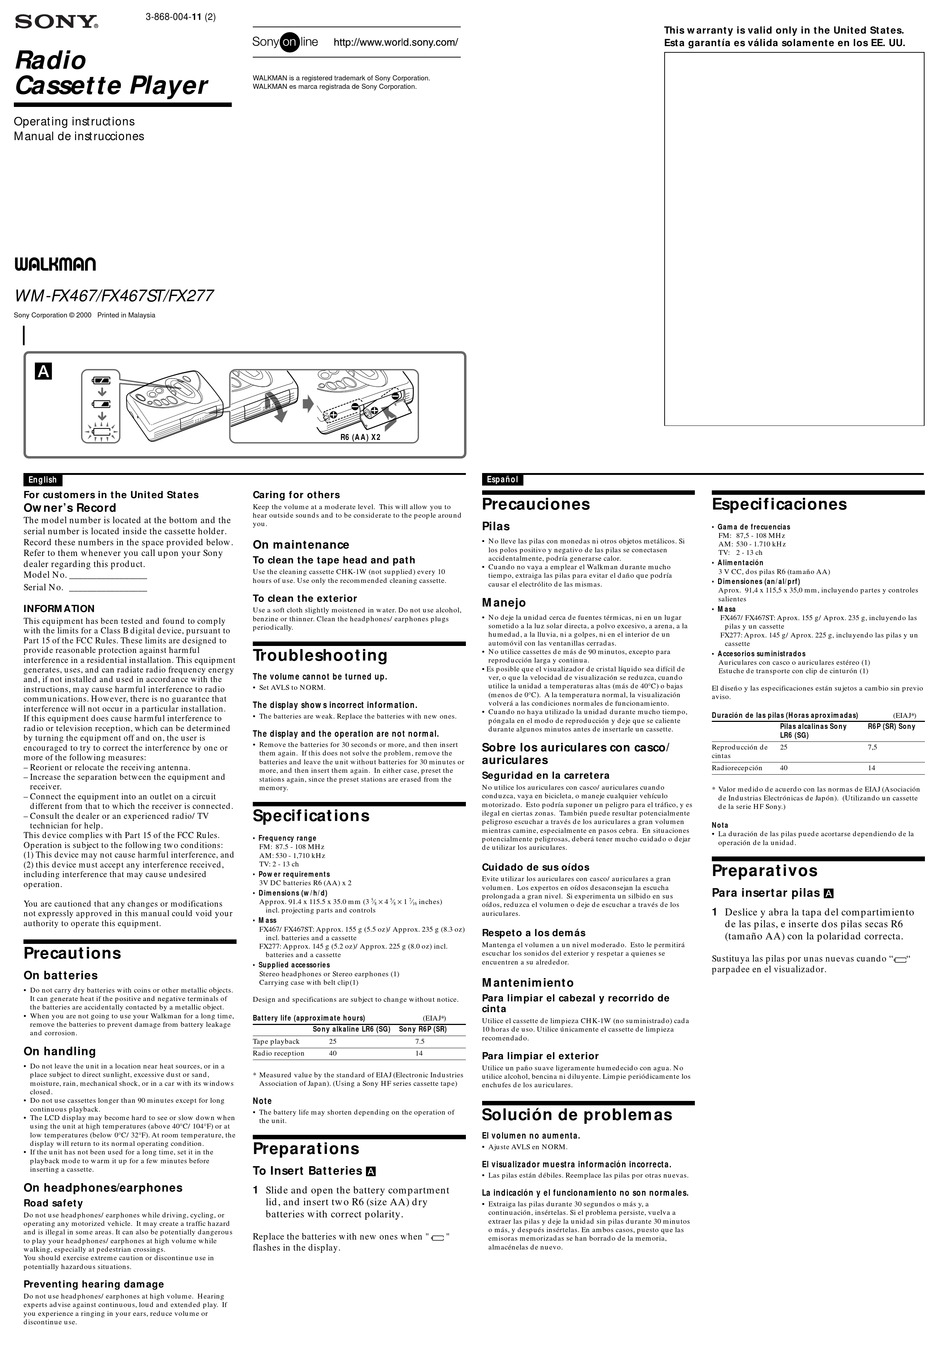 SONY WALKMAN FX277 OPERATING INSTRUCTIONS Pdf Download